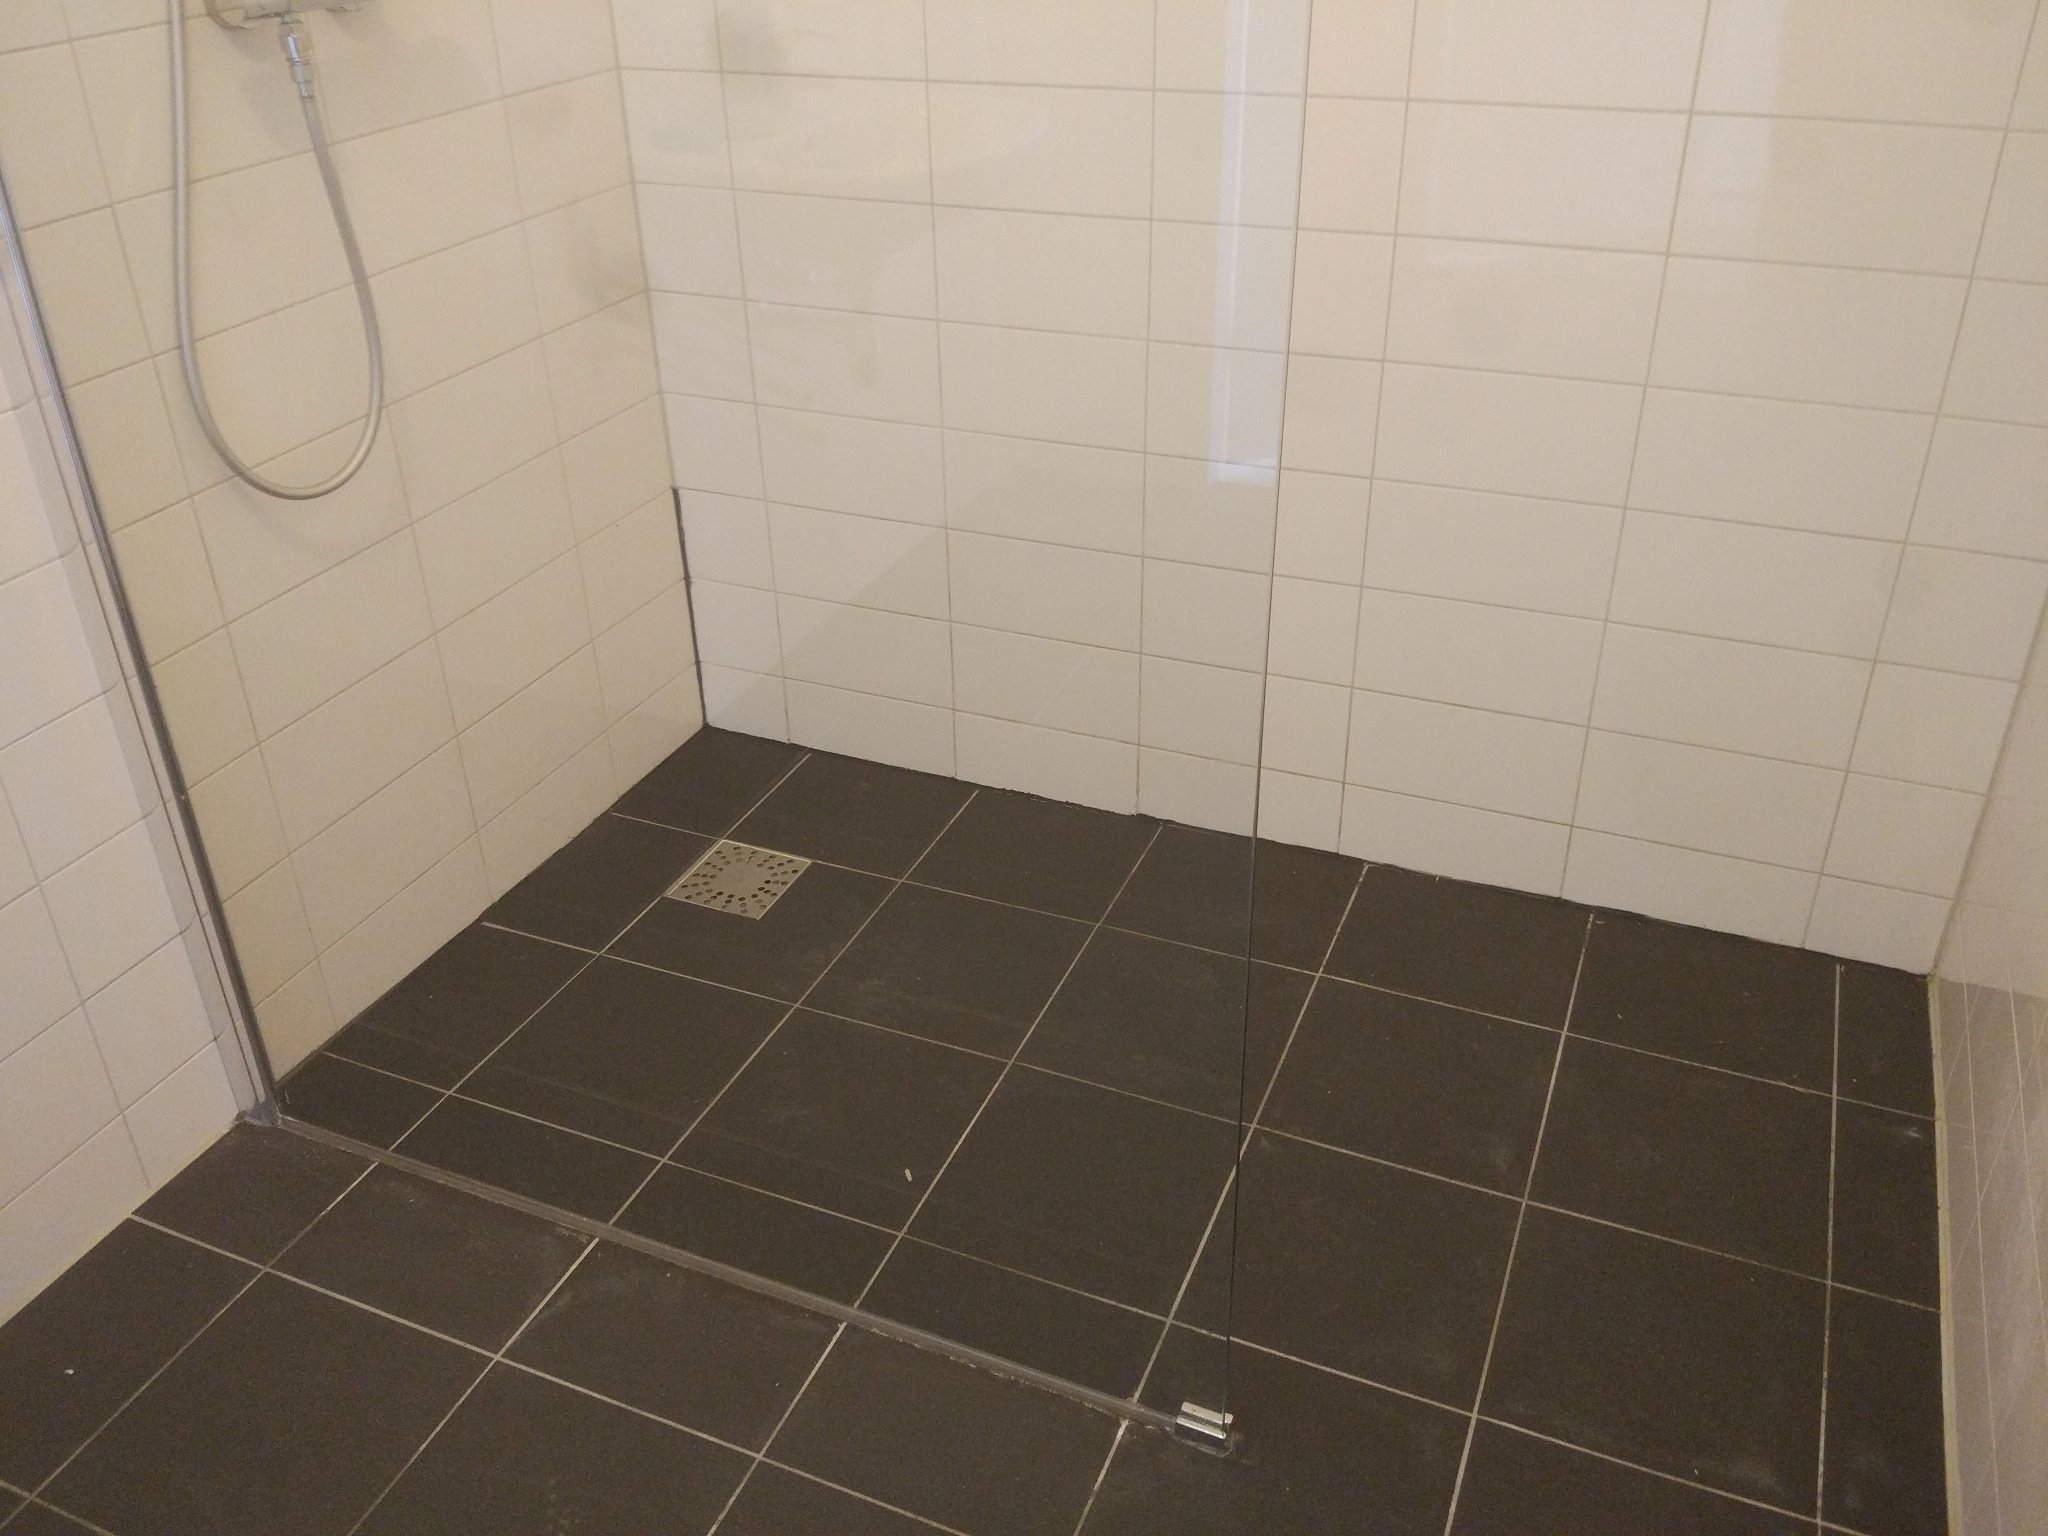 Grijze badkamer kit quick step imu eik grijs met zaagsnedes